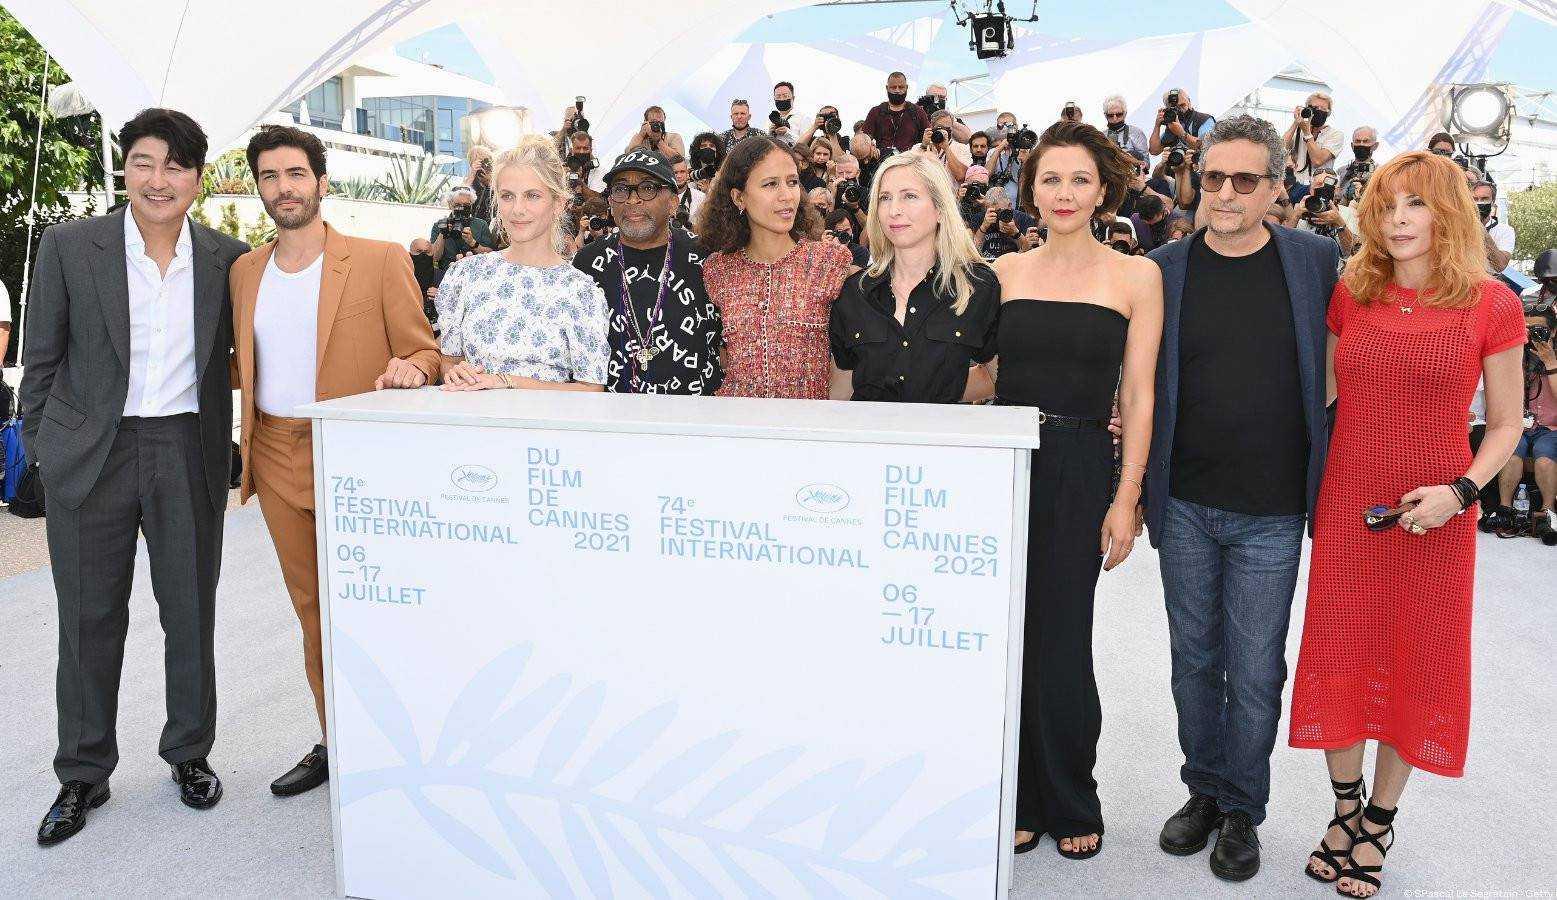 Brasil no Festival de Cannes 2021